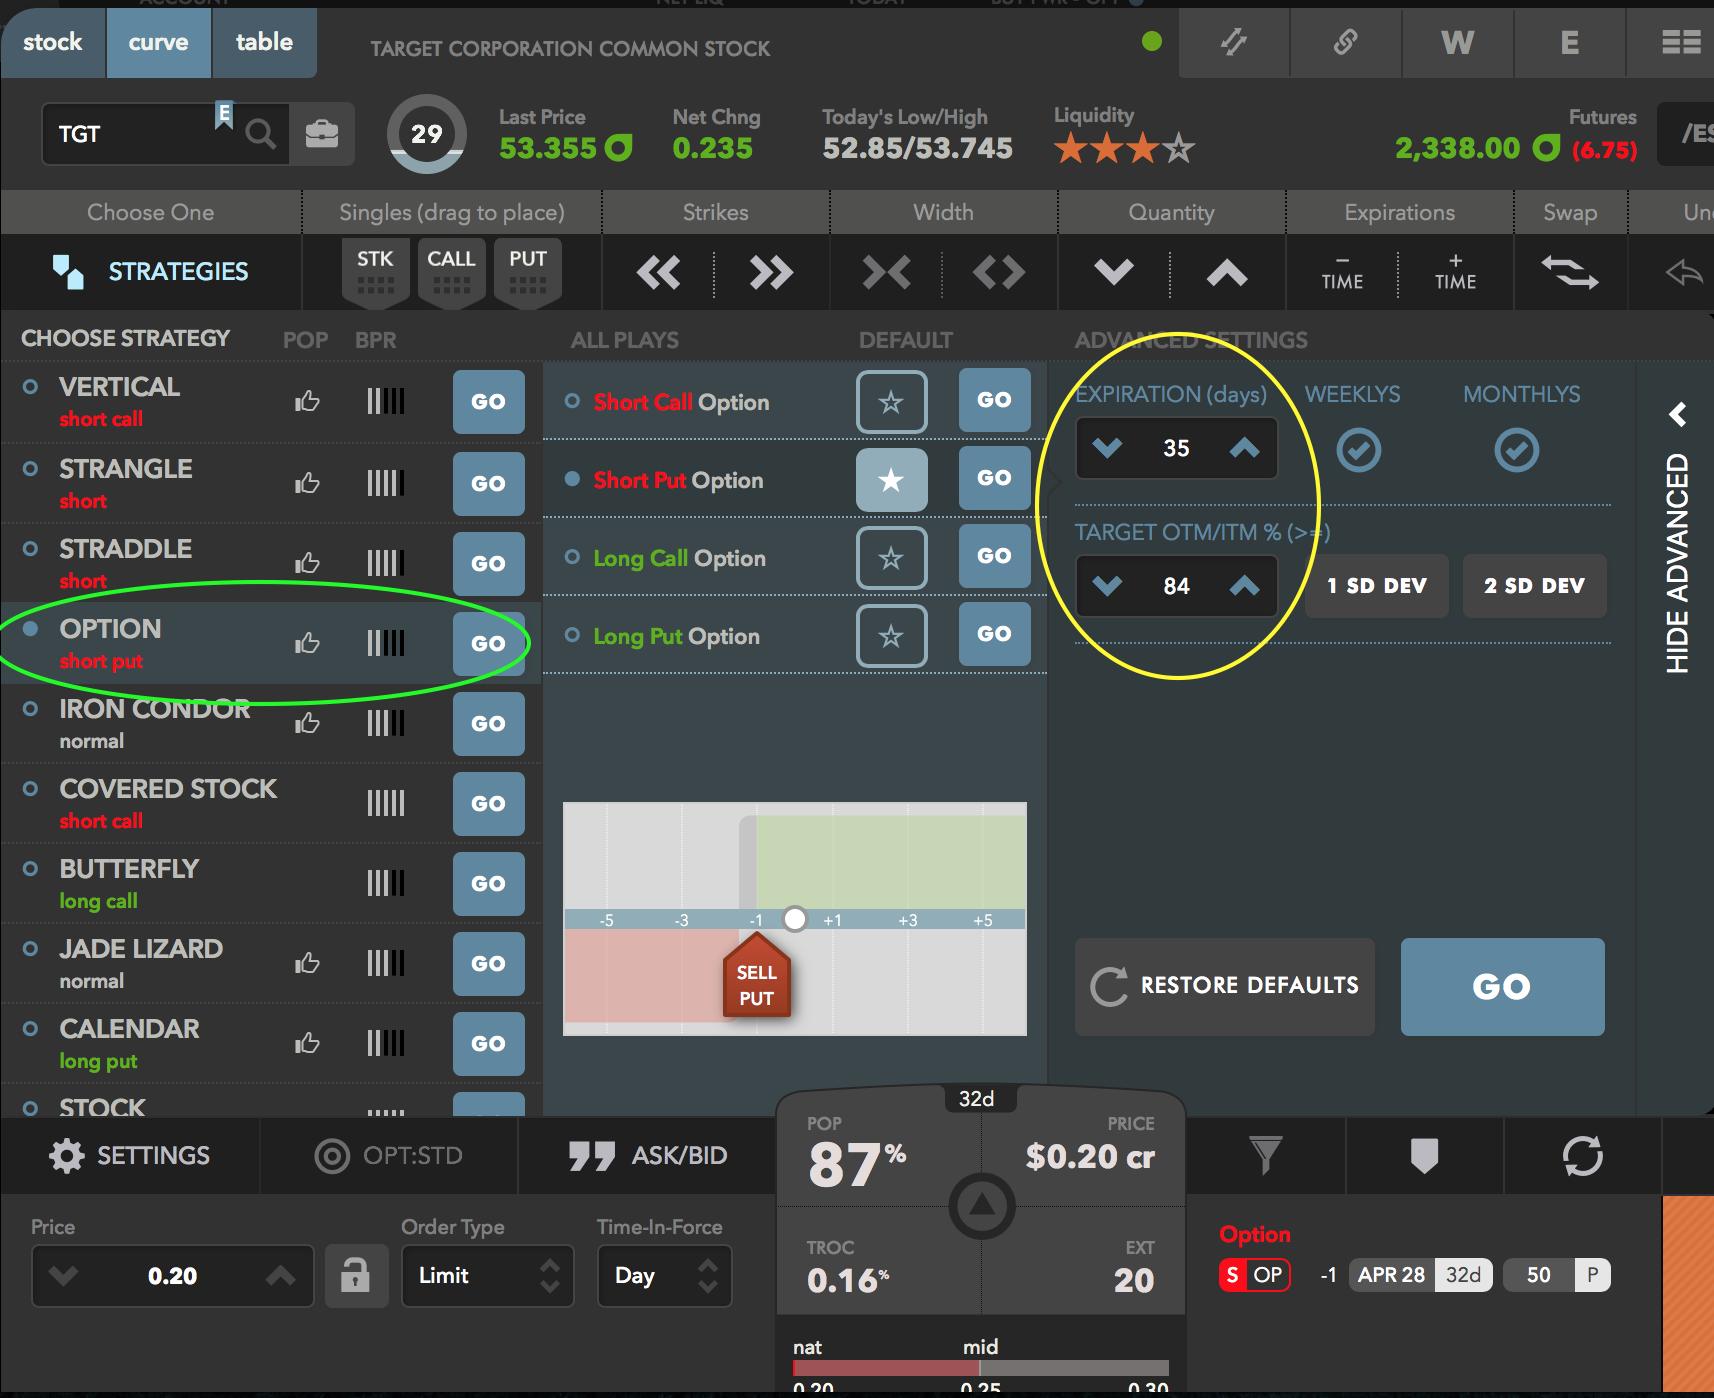 Mb trading options platform